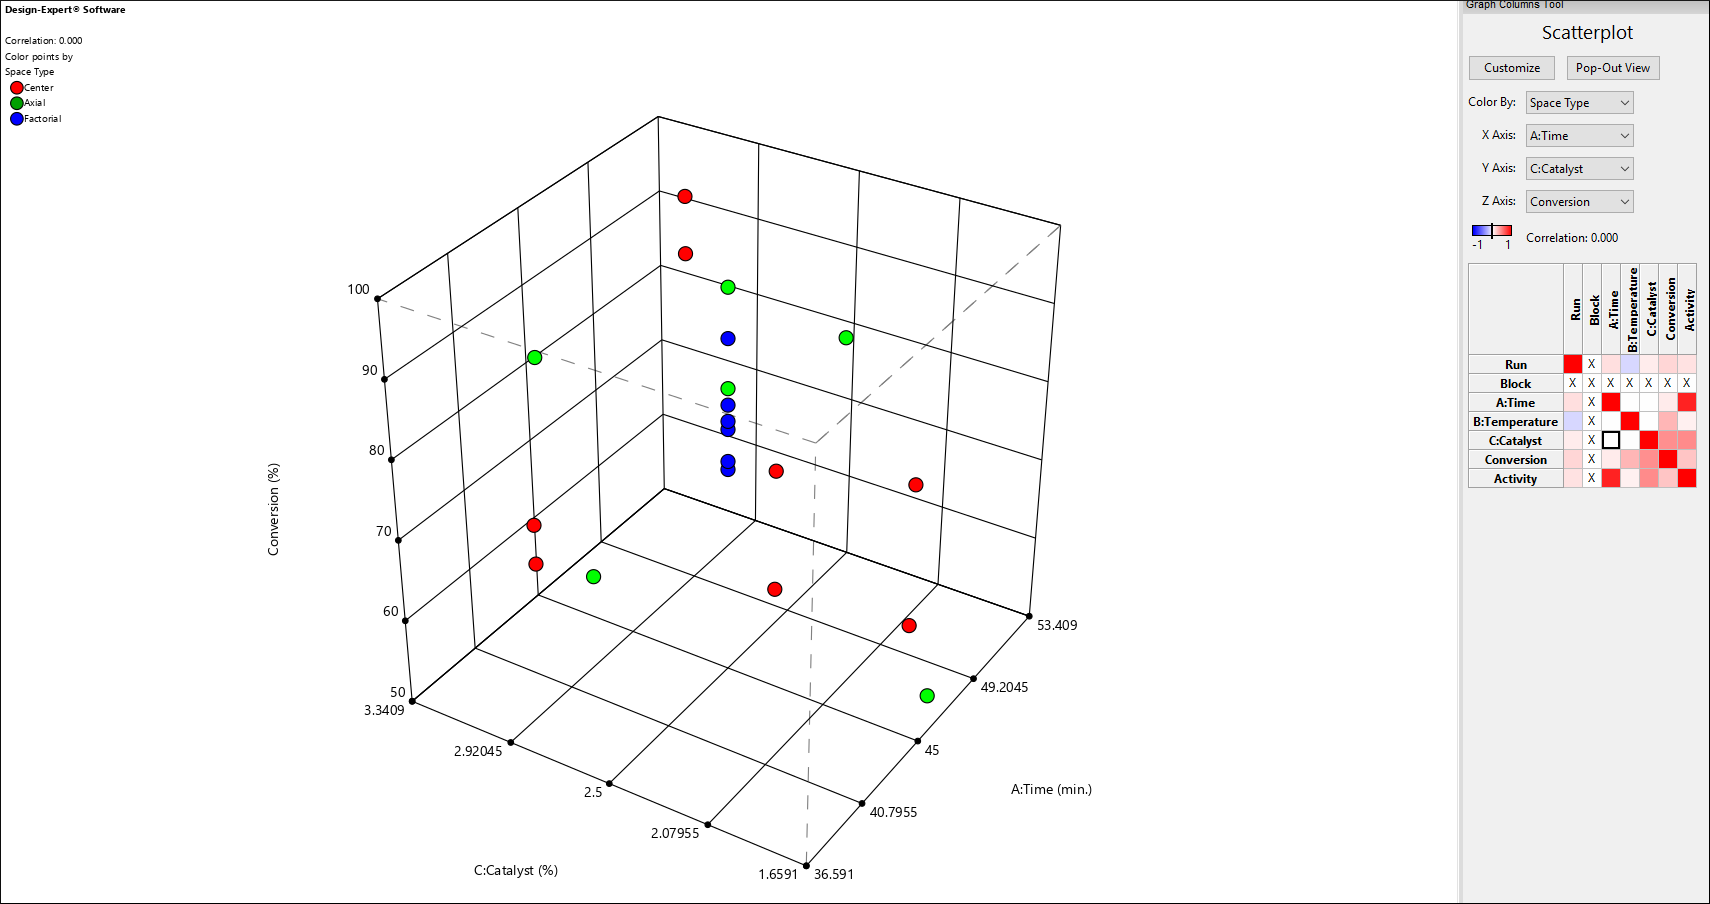 ../../_images/multifactor-rsm-3d-scatterplots.PNG